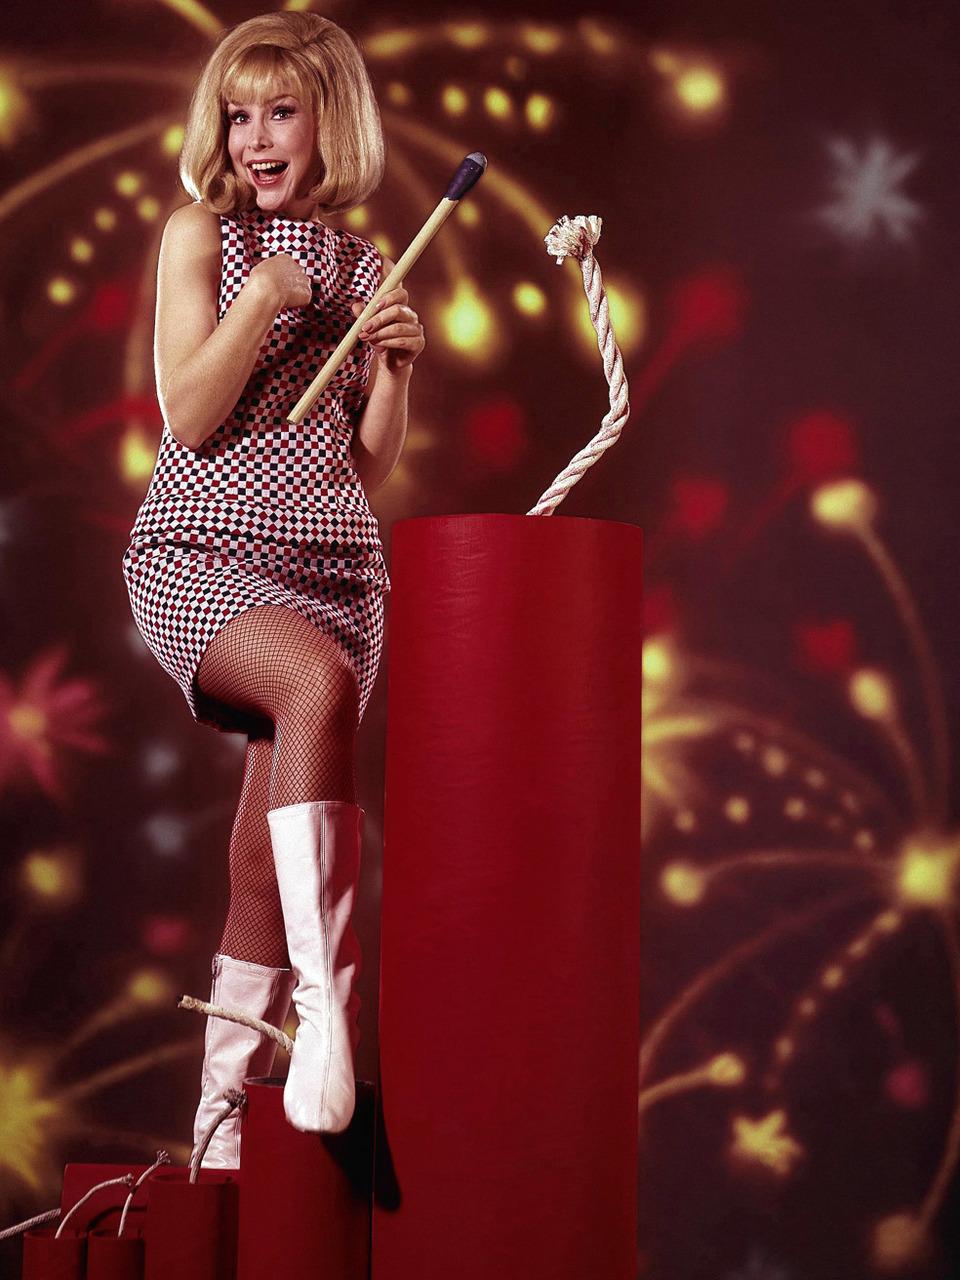 Barbara Eden wishing everyone a happy July4th